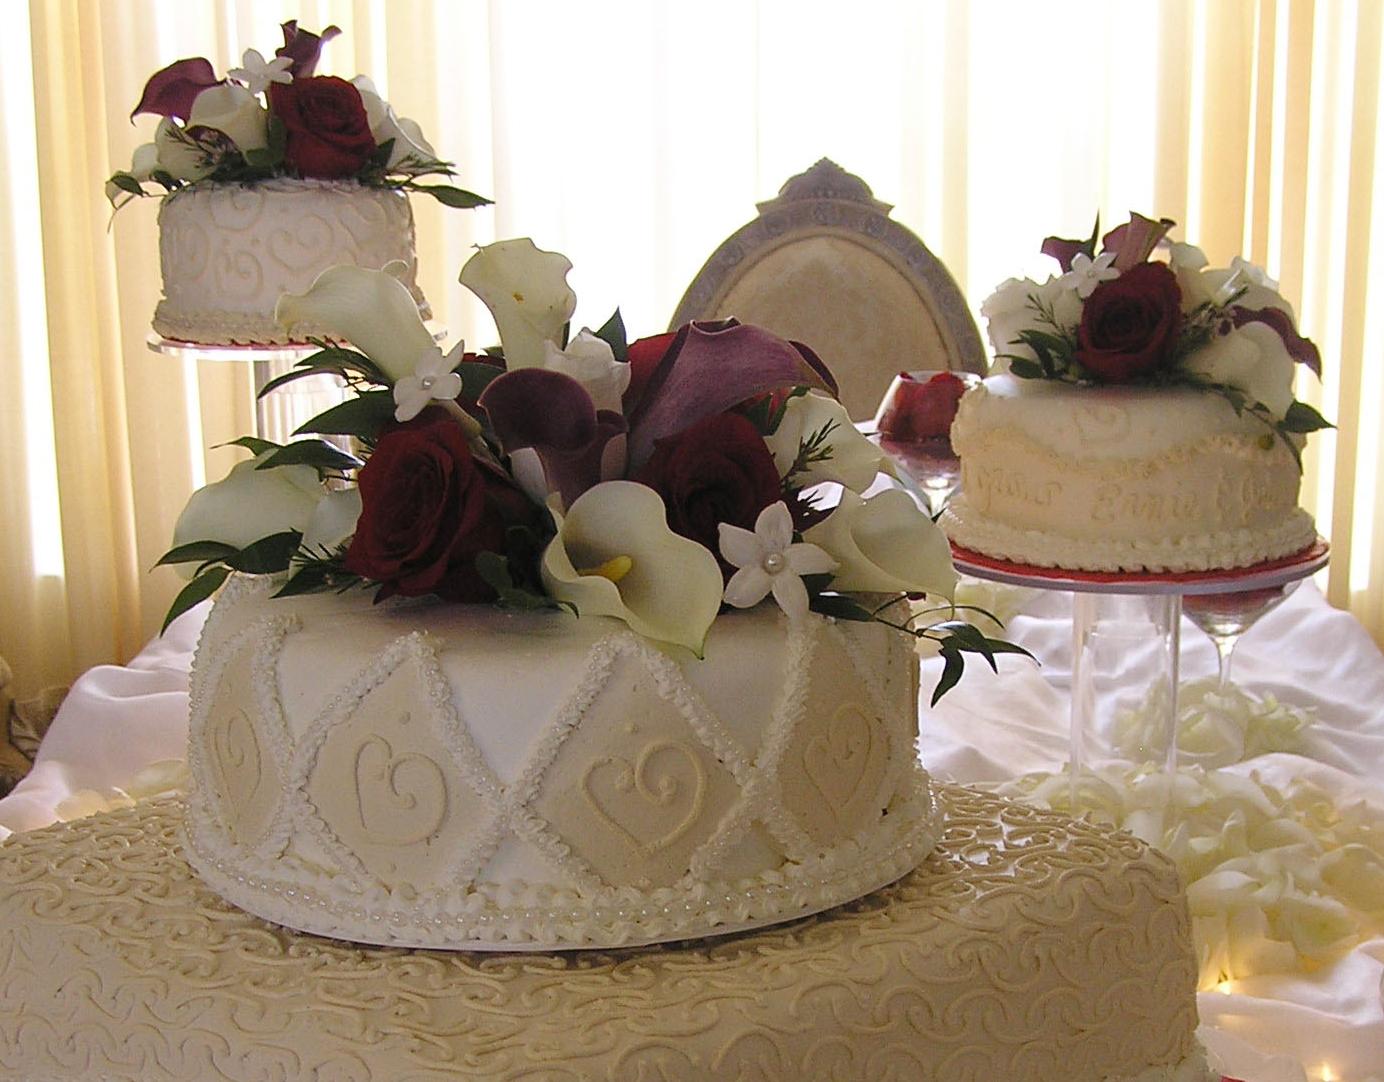 11 Square Wedding Cakes Burgundy And Champagne Photo - Fruit Wedding ...